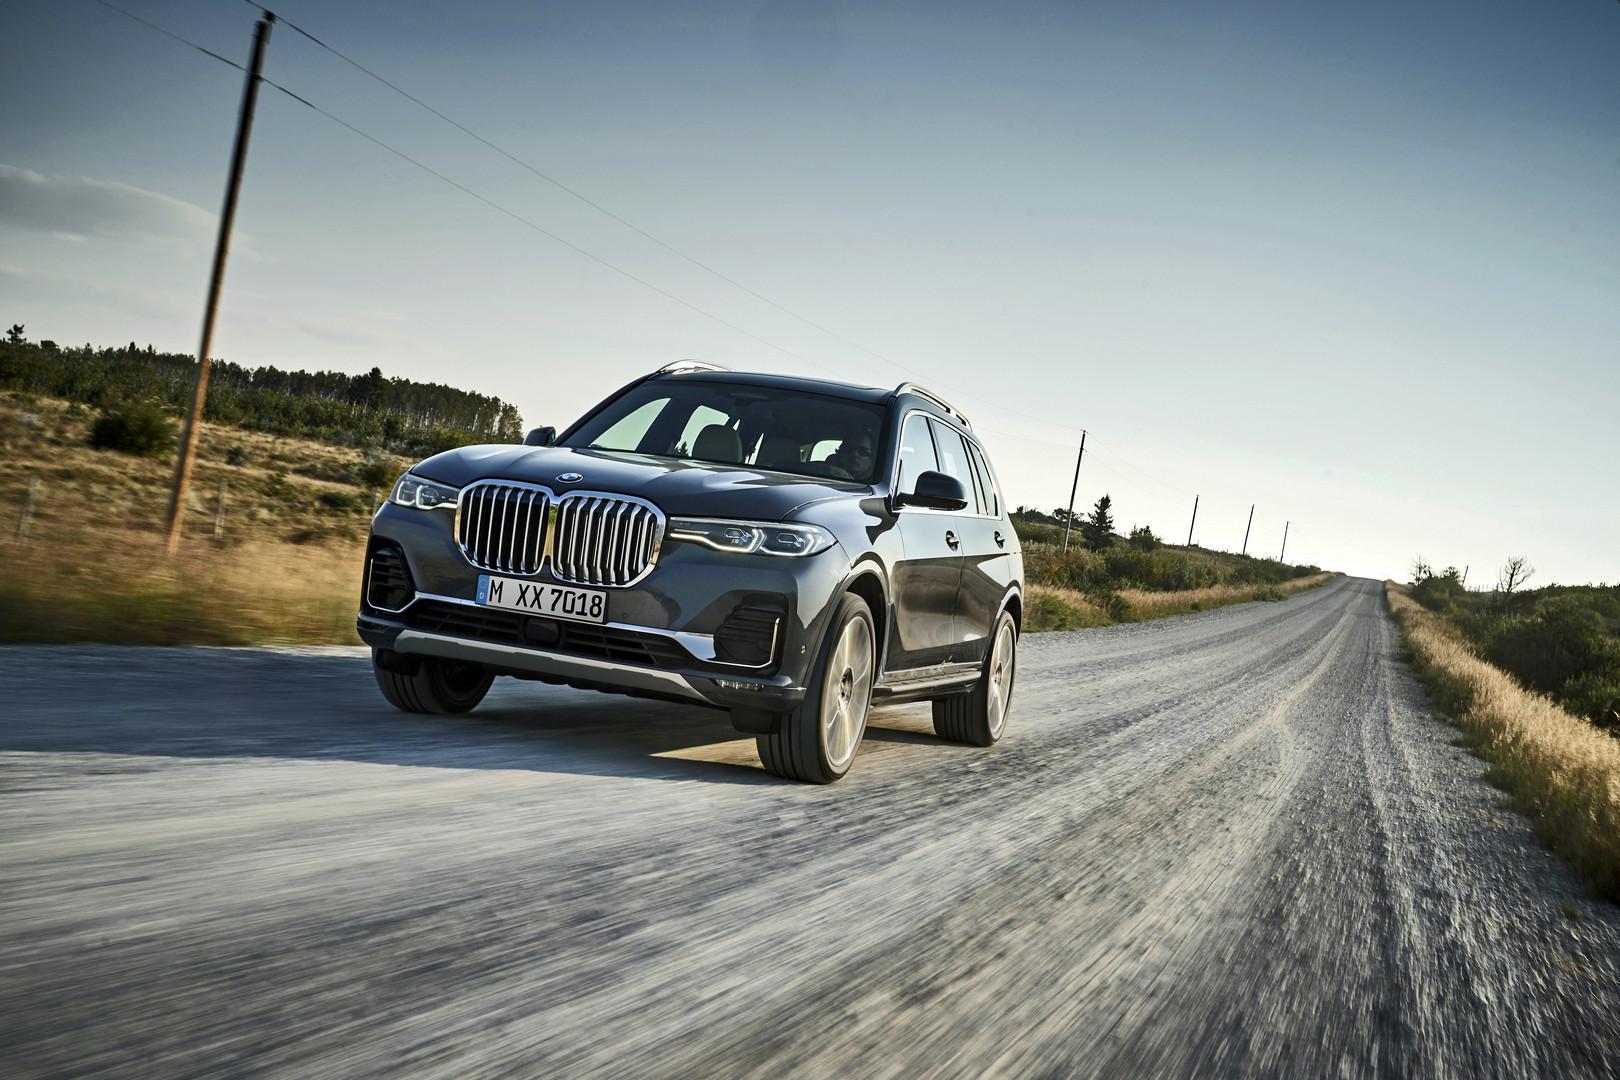 2019 BMW X7 Exterior